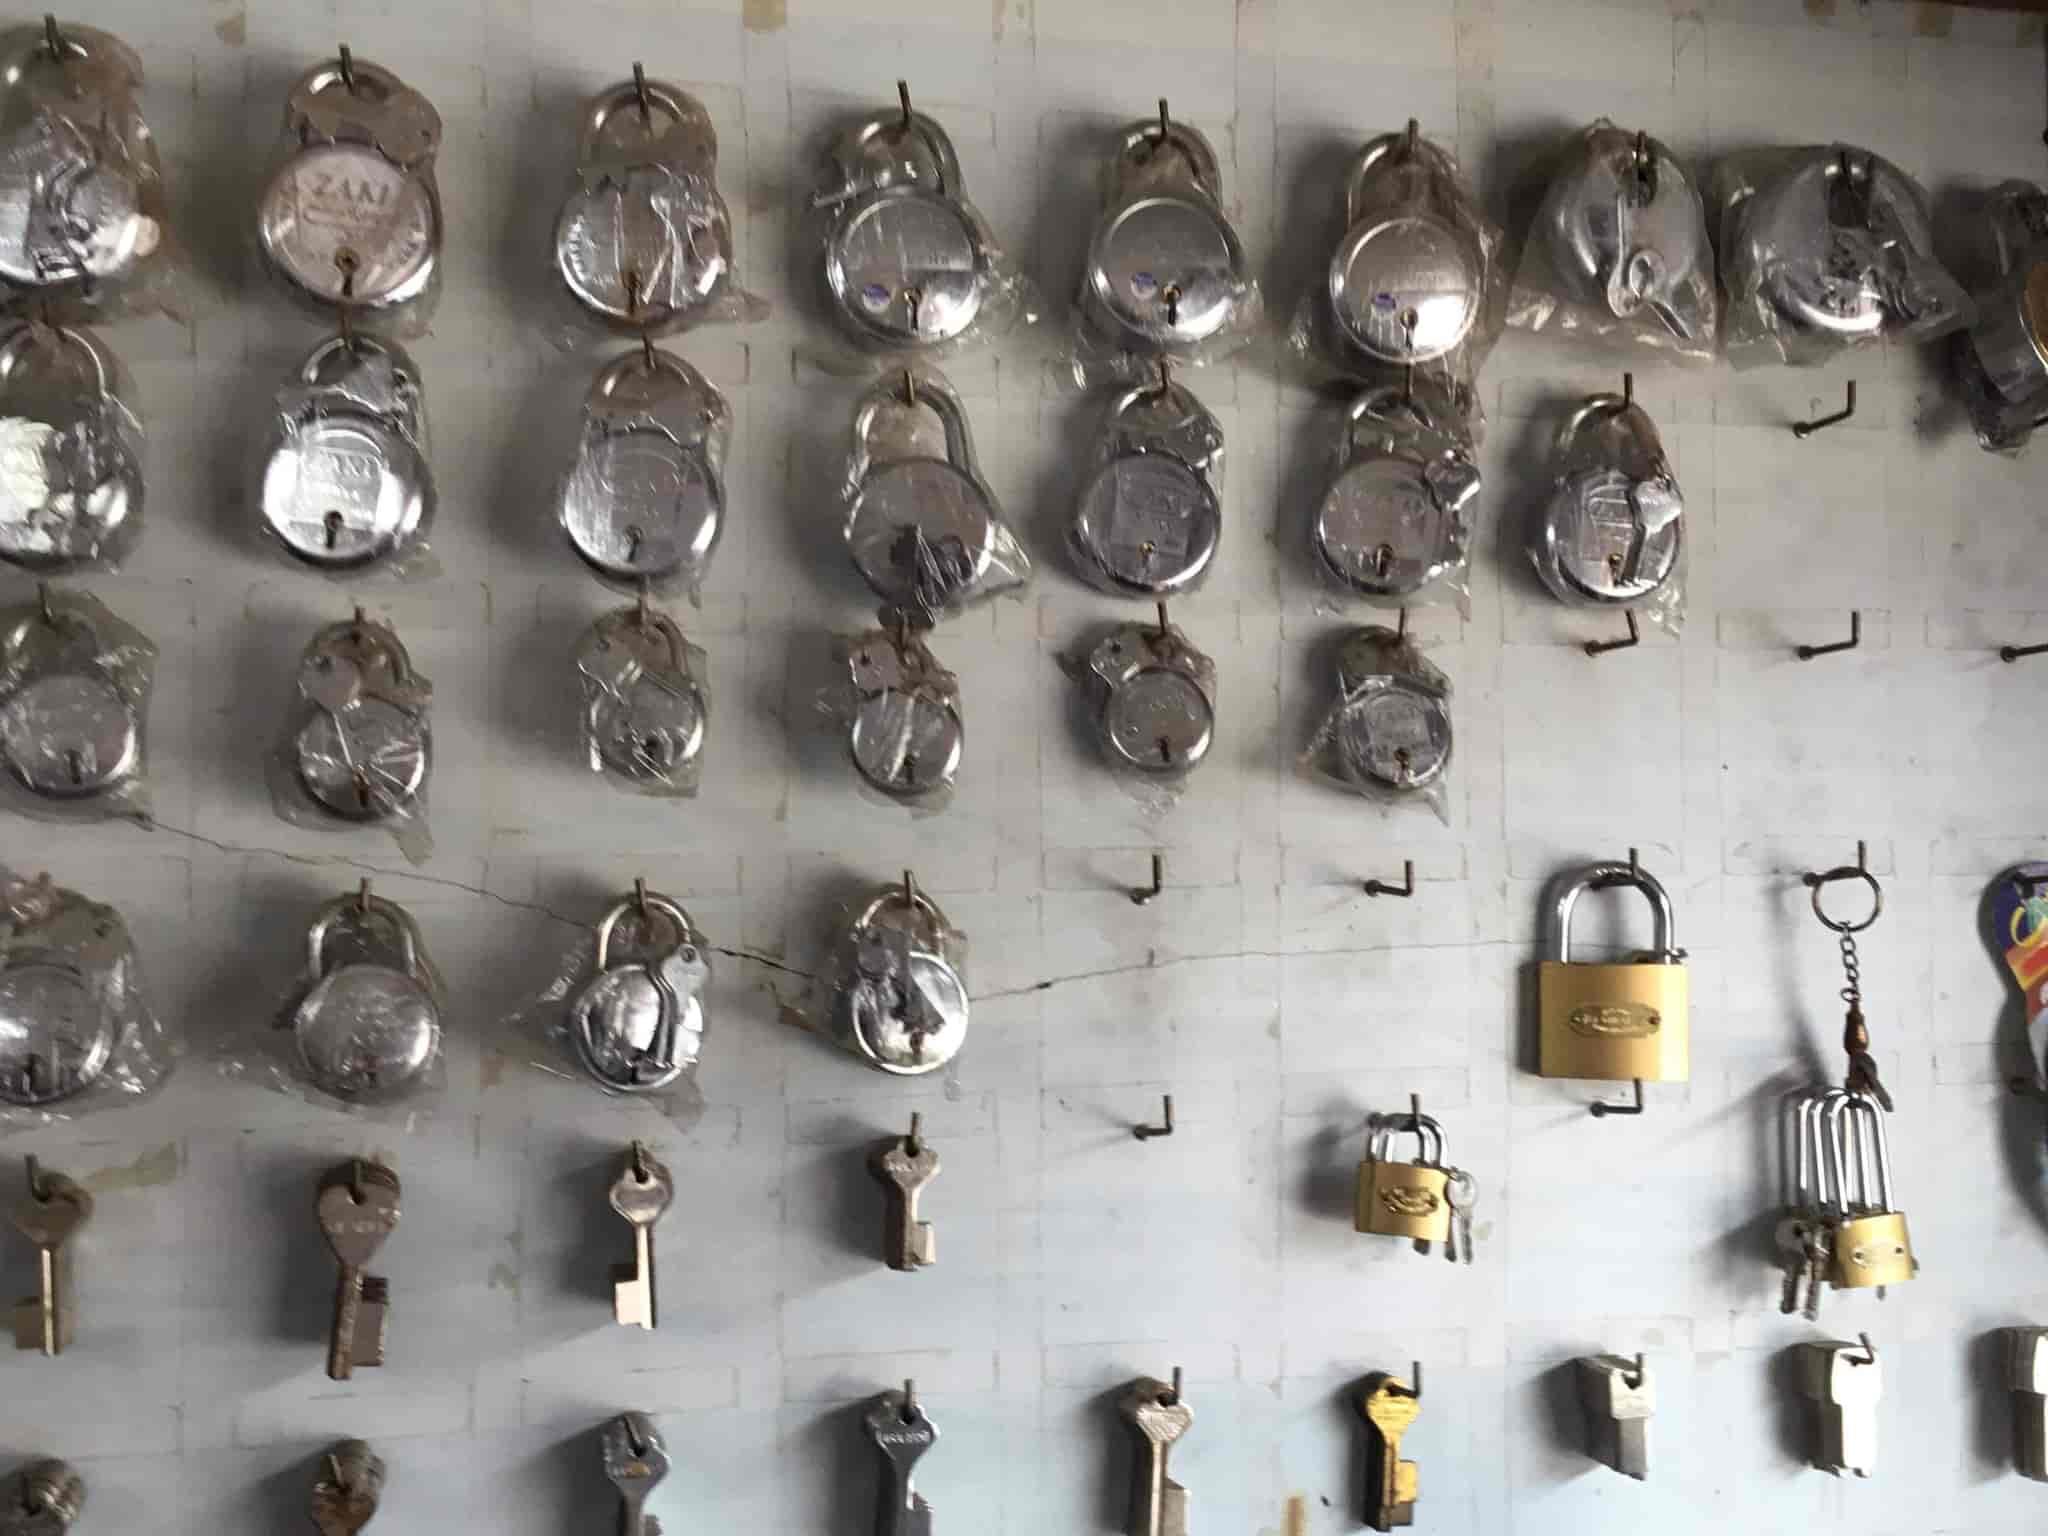 Popular All Types Of Key Makers Photos, Sarjapur Road, Jabalpur